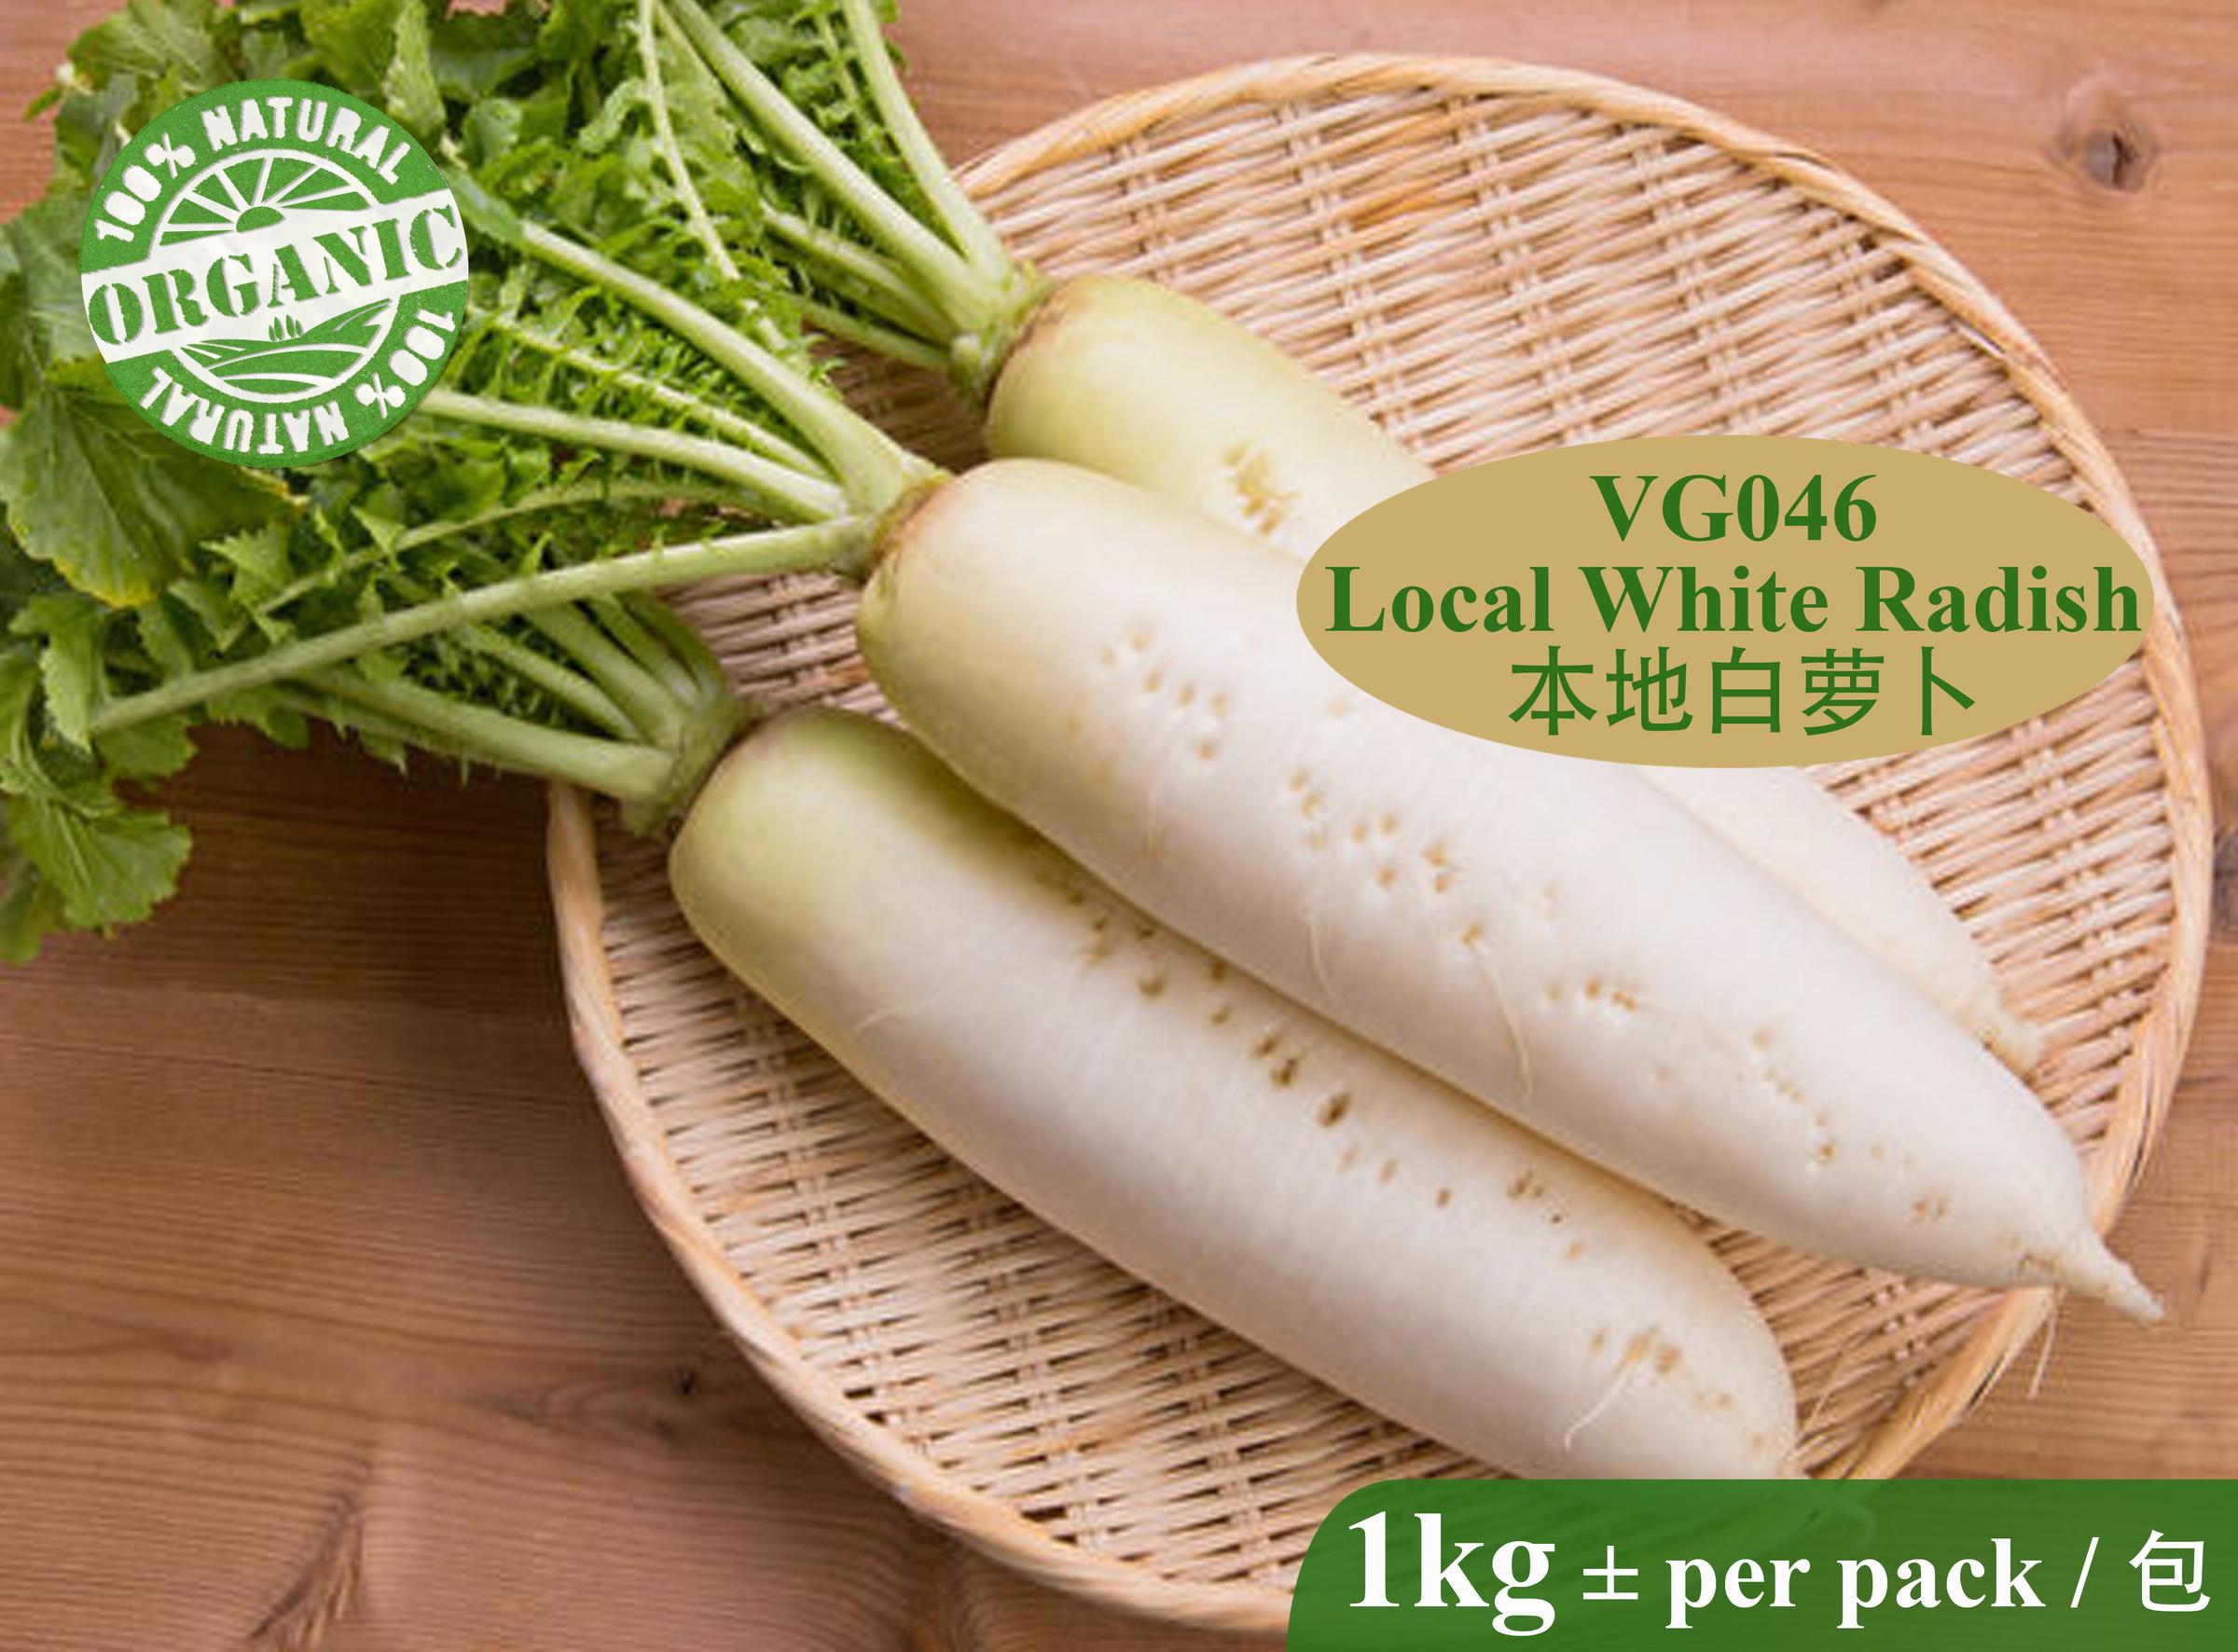 VG046 Local White Radish-RM10.00 per kg+.jpg